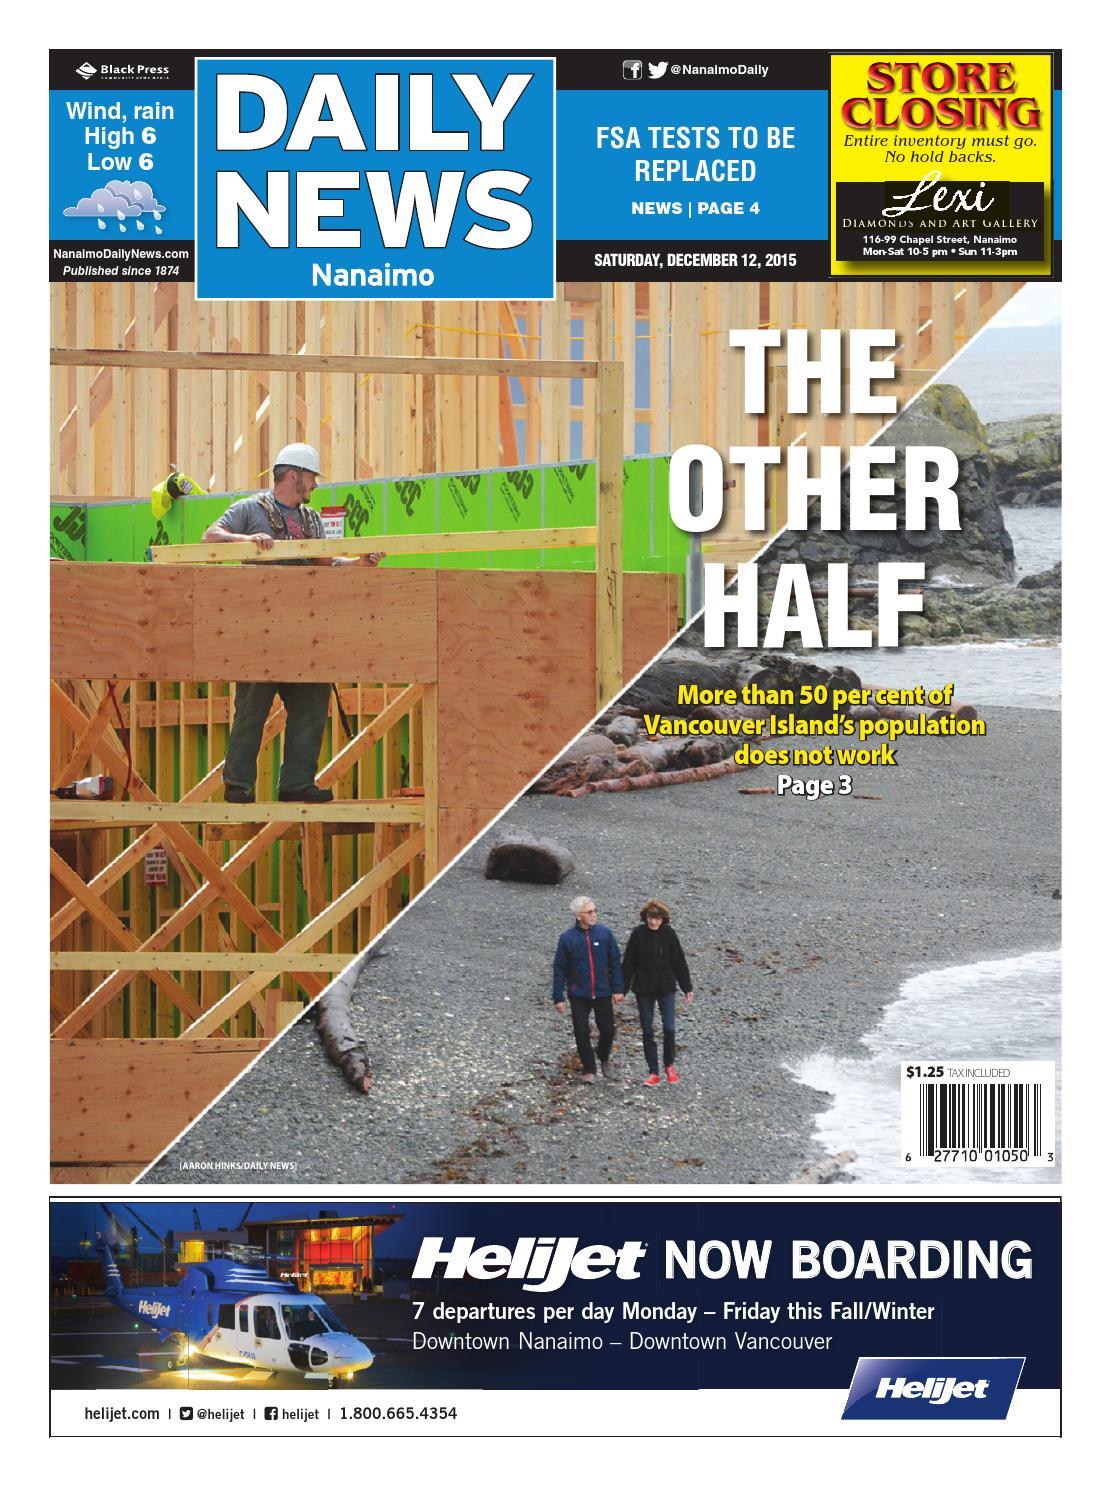 Nanaimo Daily News, December 12, 2015 by Black Press - issuu